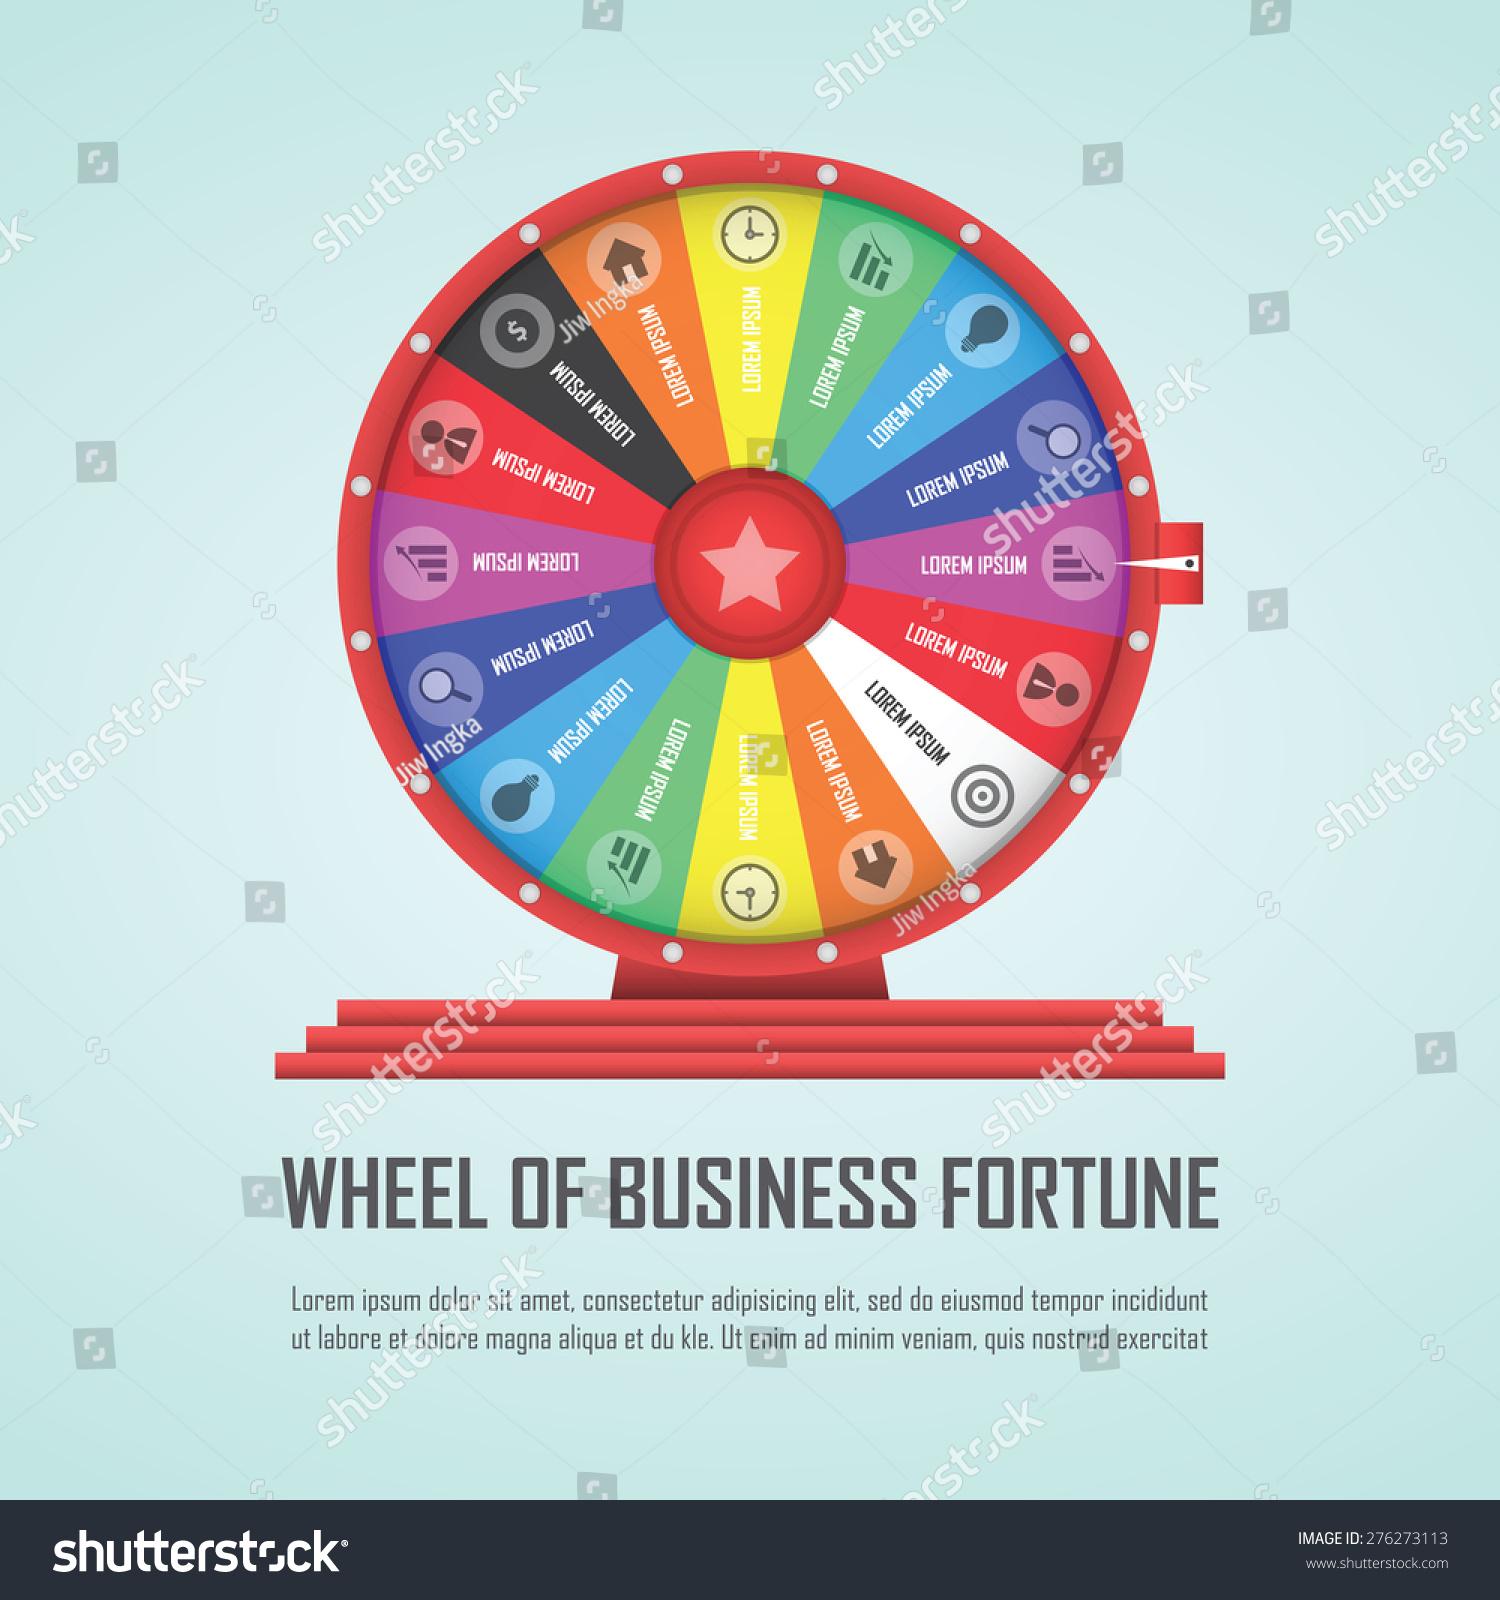 Wheel Fortune Infographic Design Element Vector Stock ...